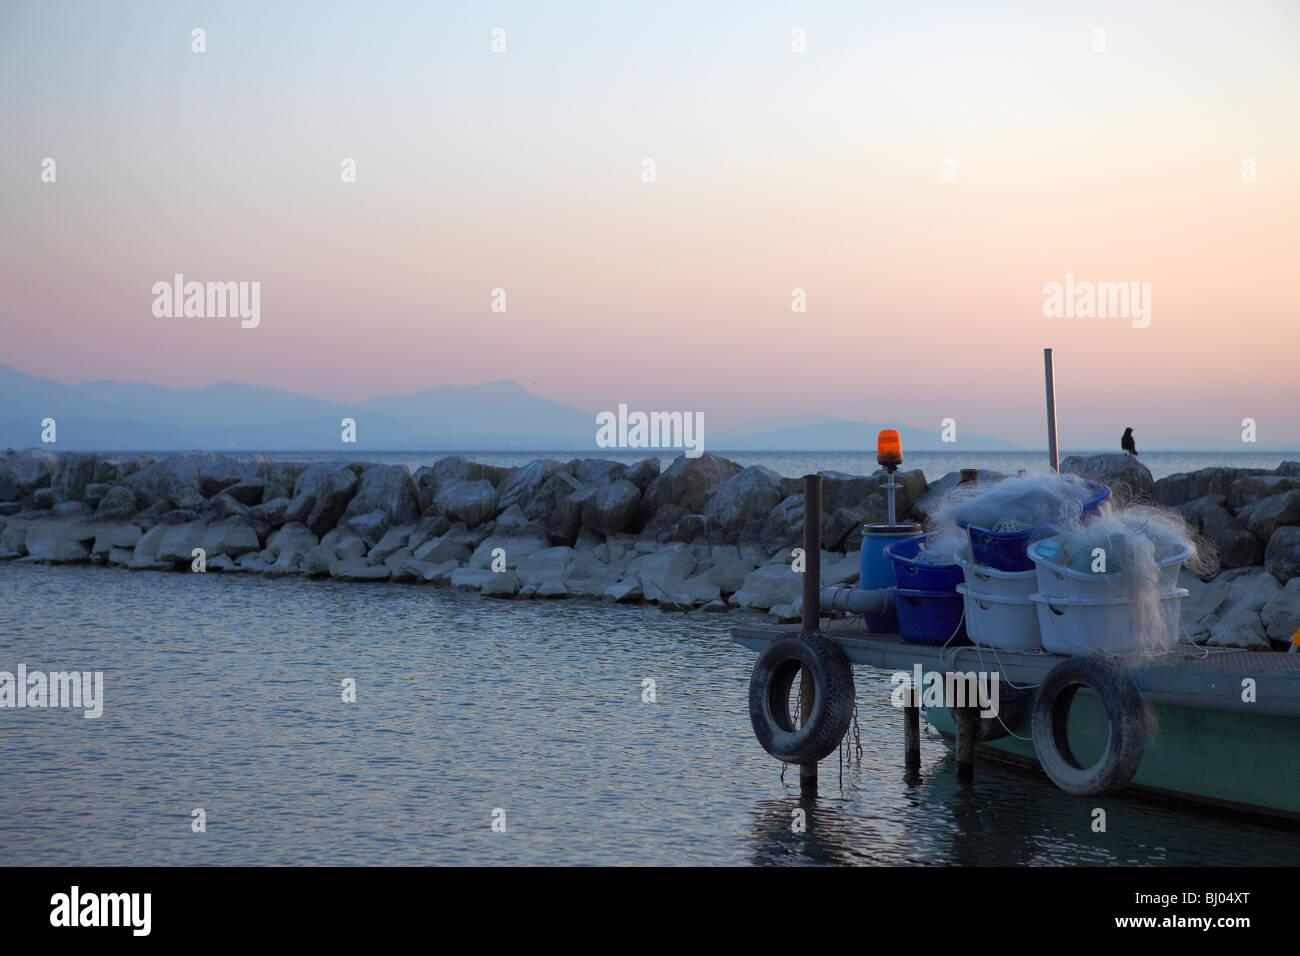 Fishing nets at Lake Geneva (Lac Léman) in Lausanne, Switzerland - Stock Image